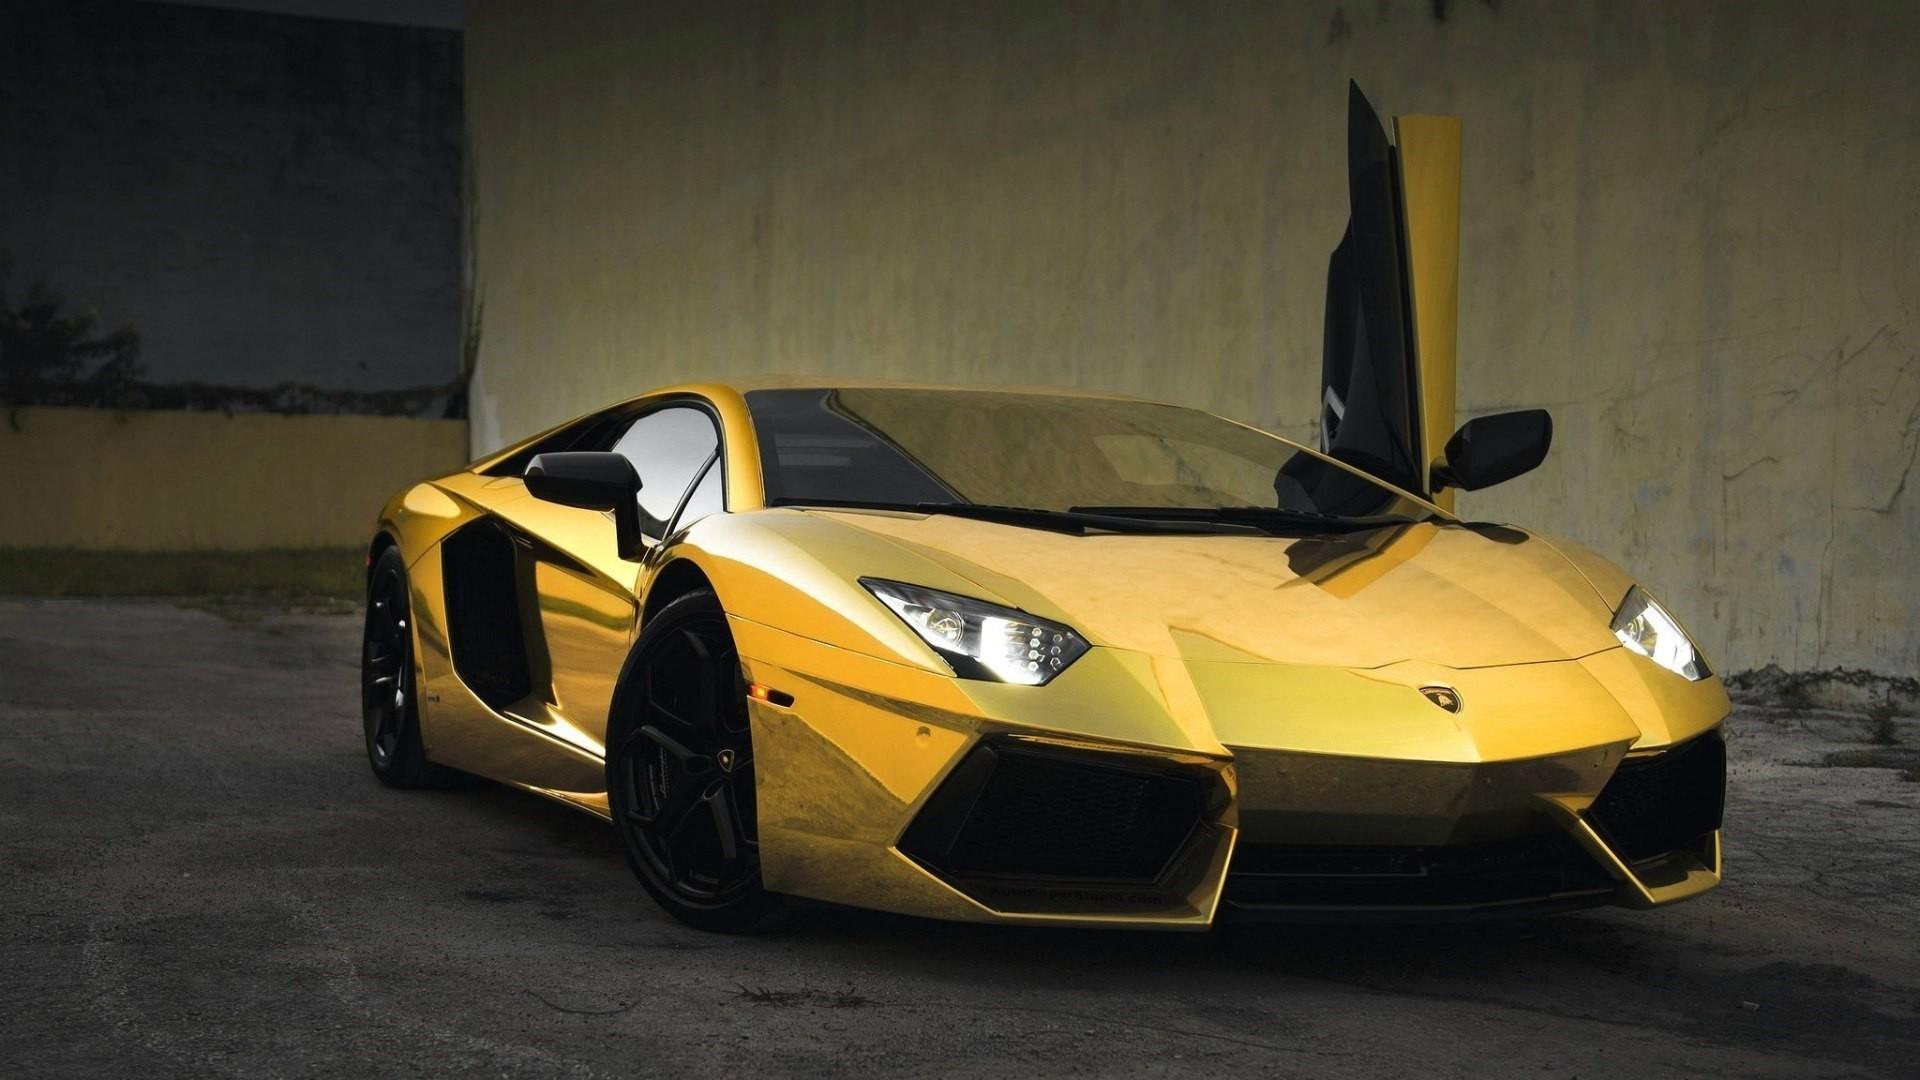 Gold Lamborghini Free Wallpaper